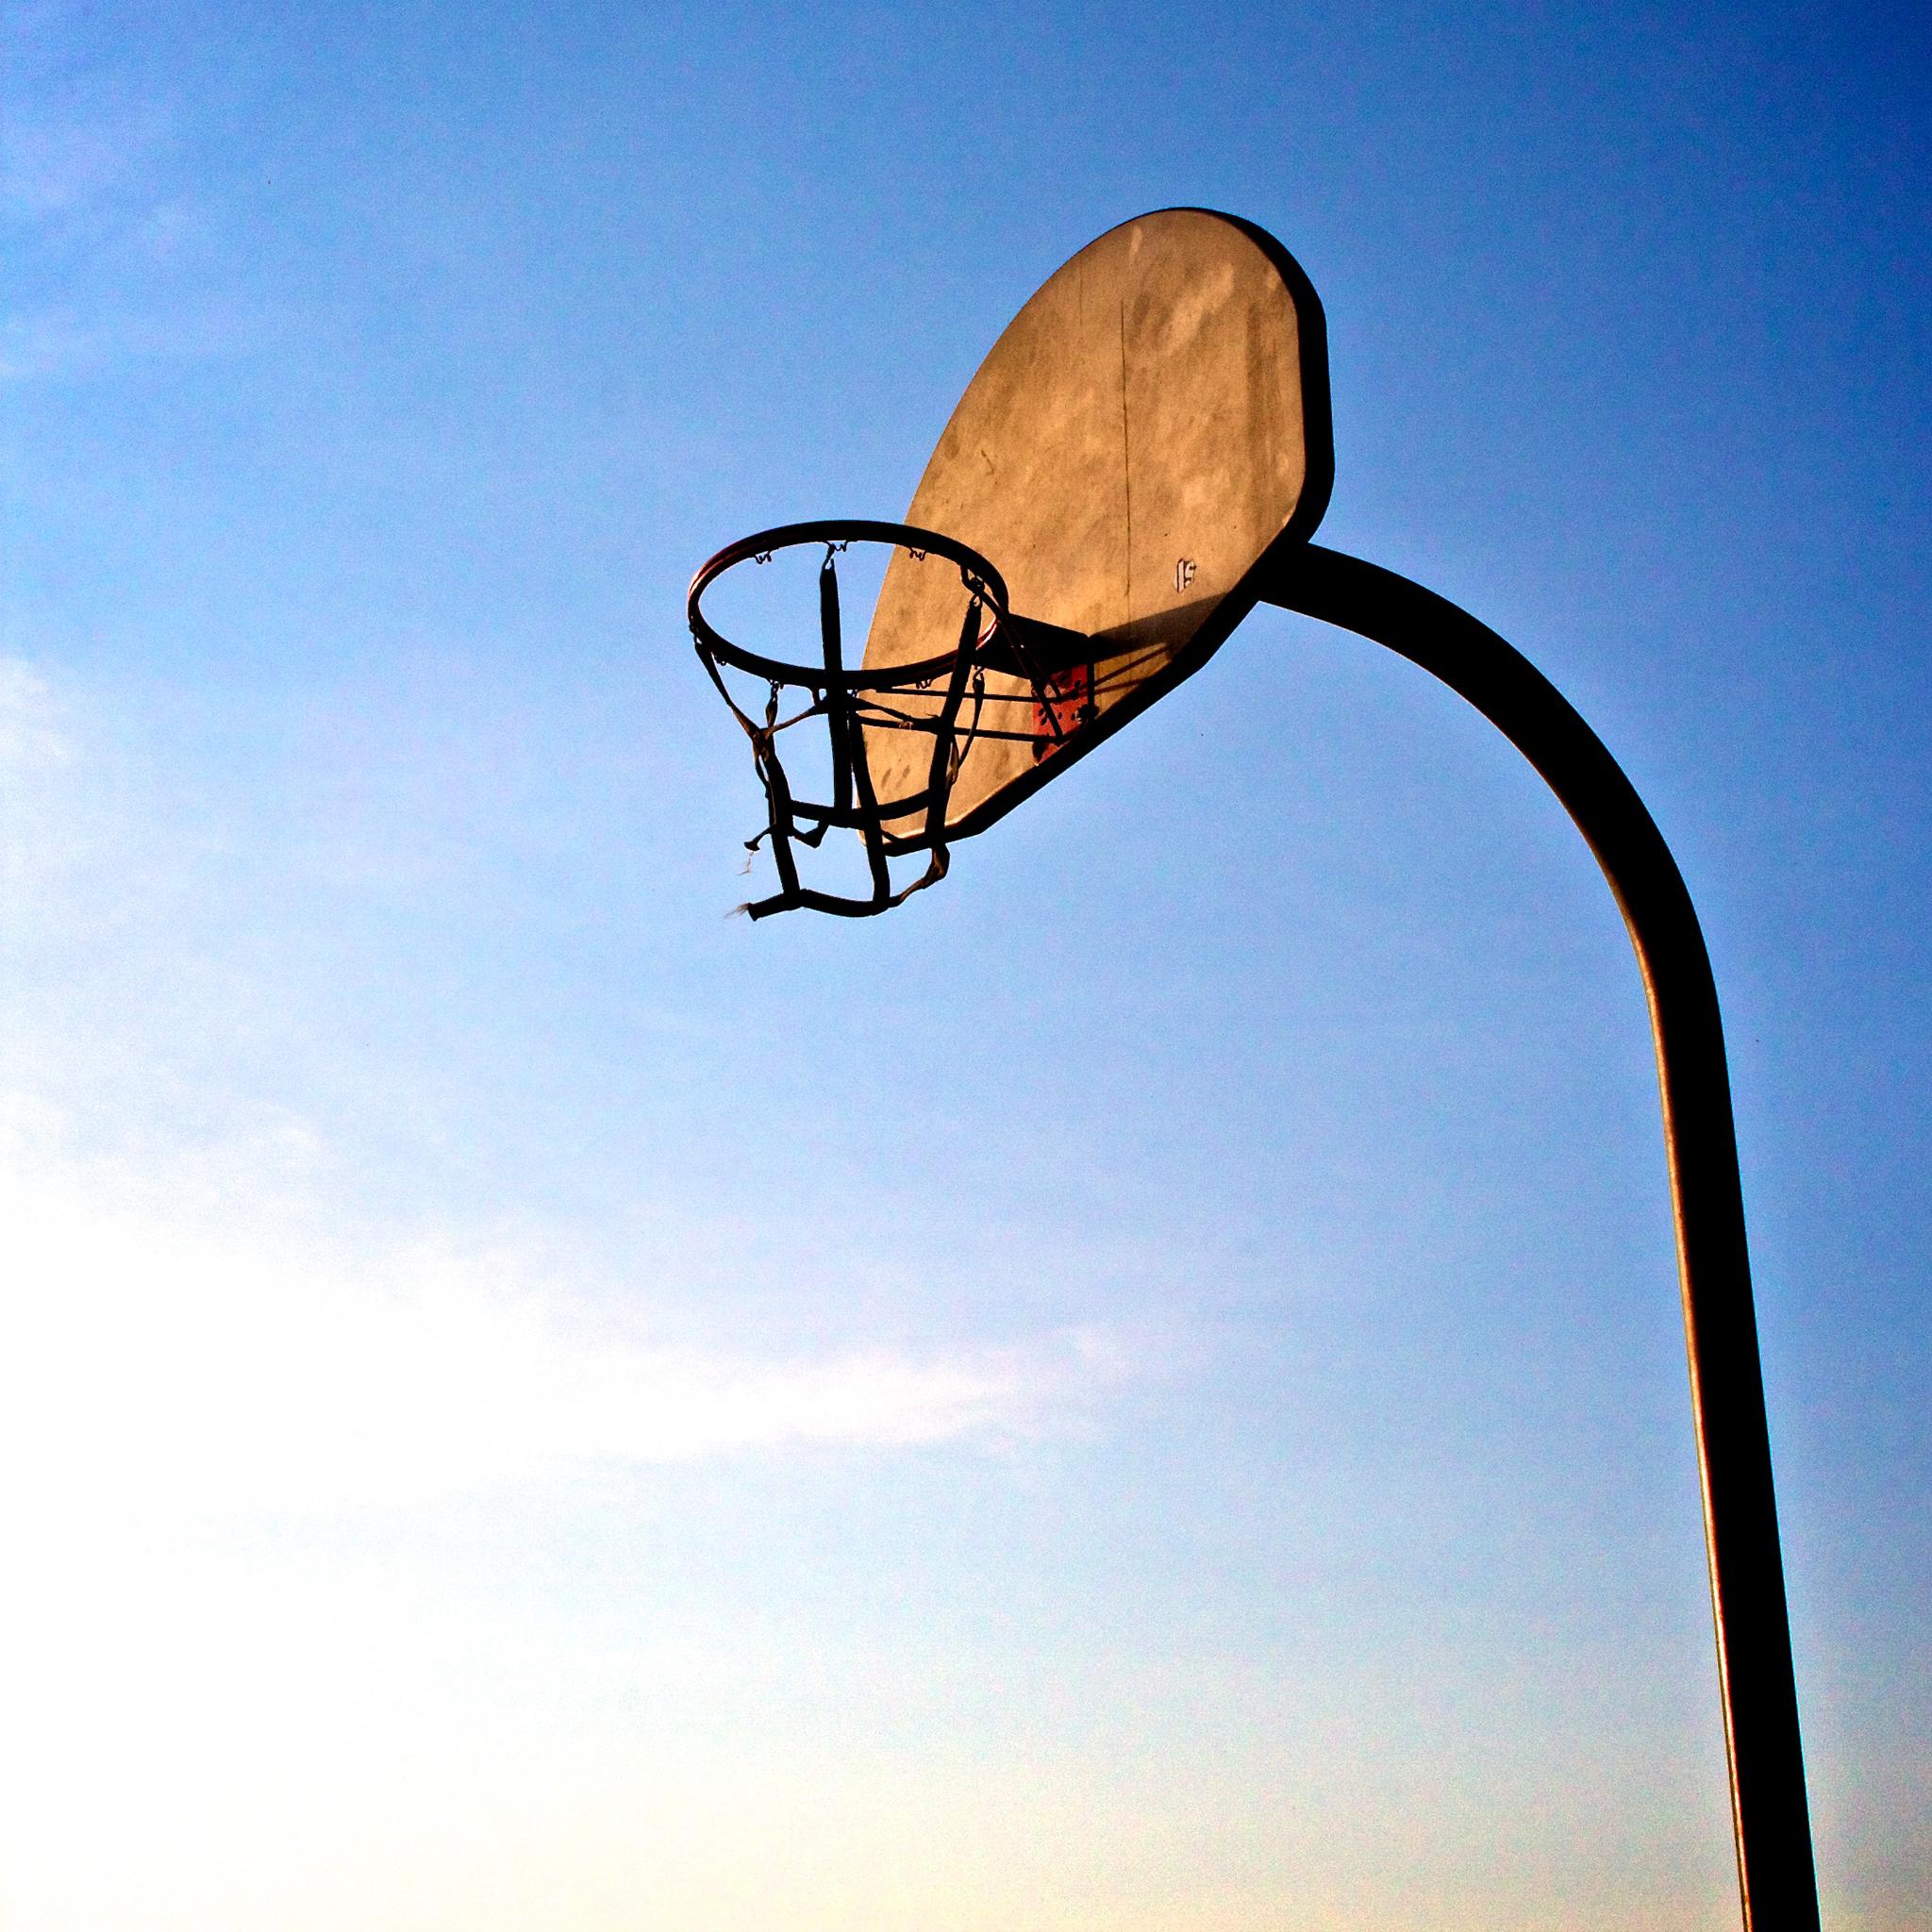 Basket_in_the_Sky_3Wallpapers_iPad